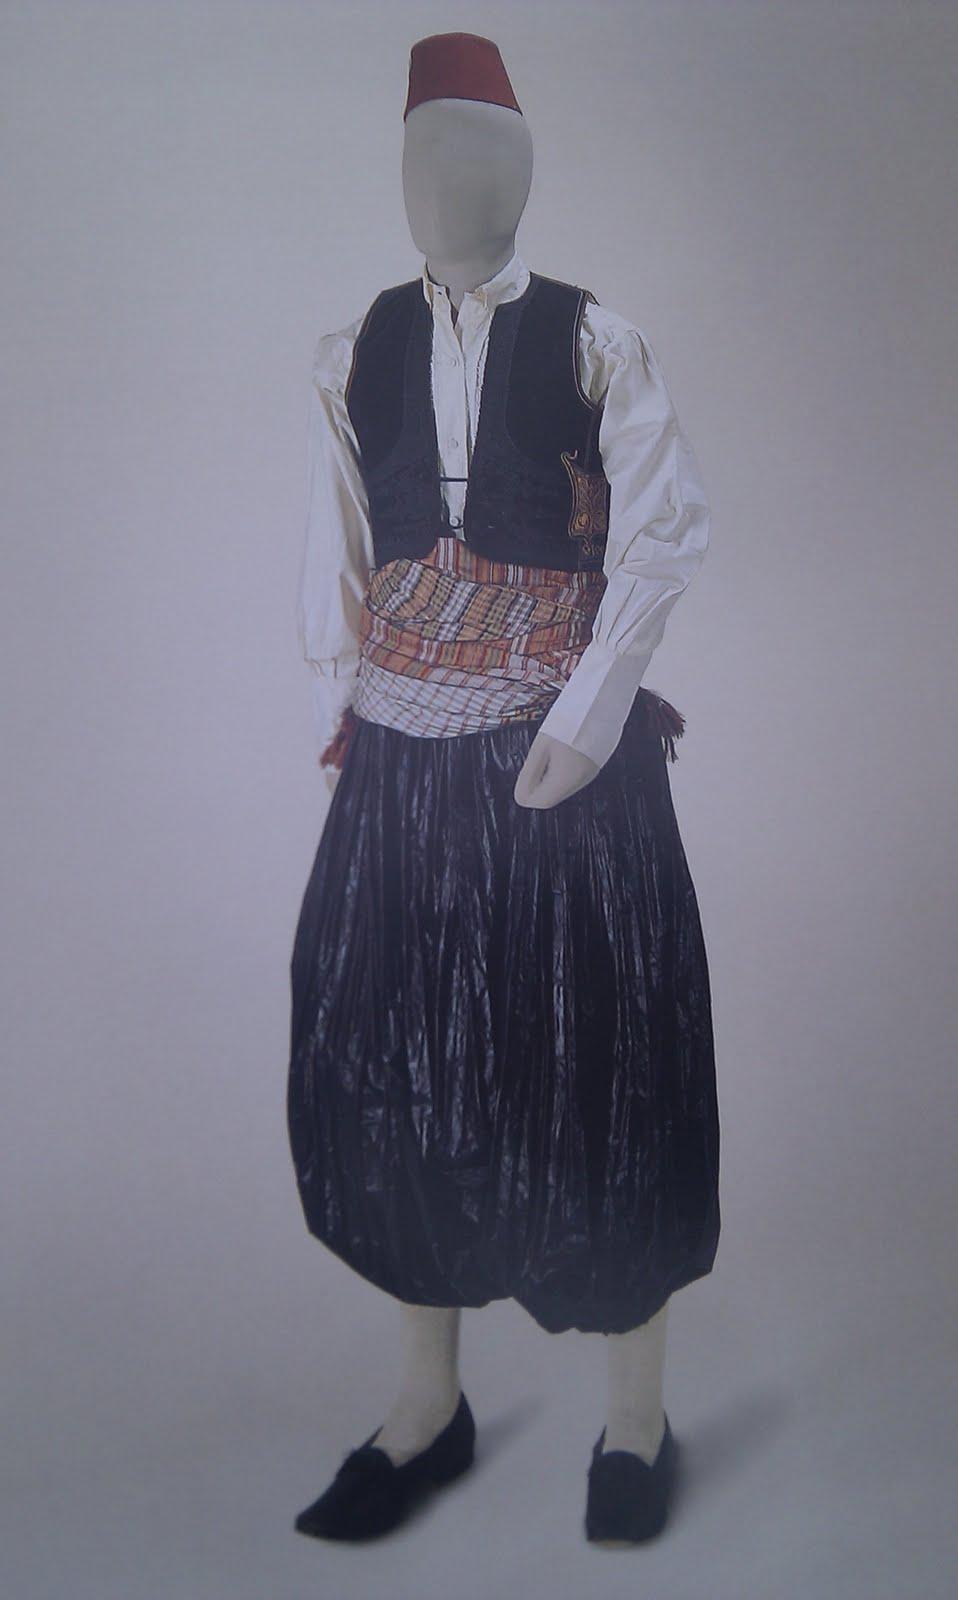 319ed544b96 Eλλήνων Παράδοση: Η κυπριακή παραδοσιακή κολλαριστή βράκα